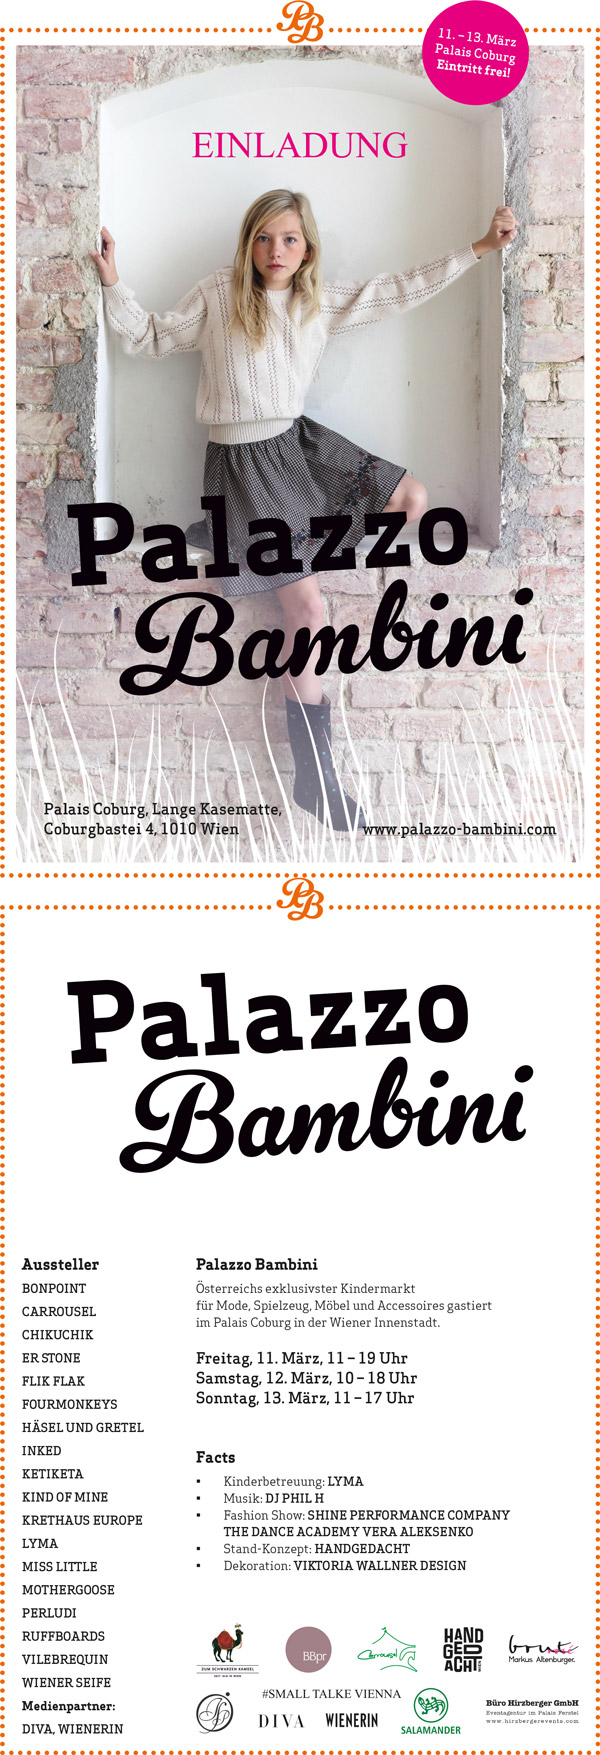 www.palazzo-bambini.com